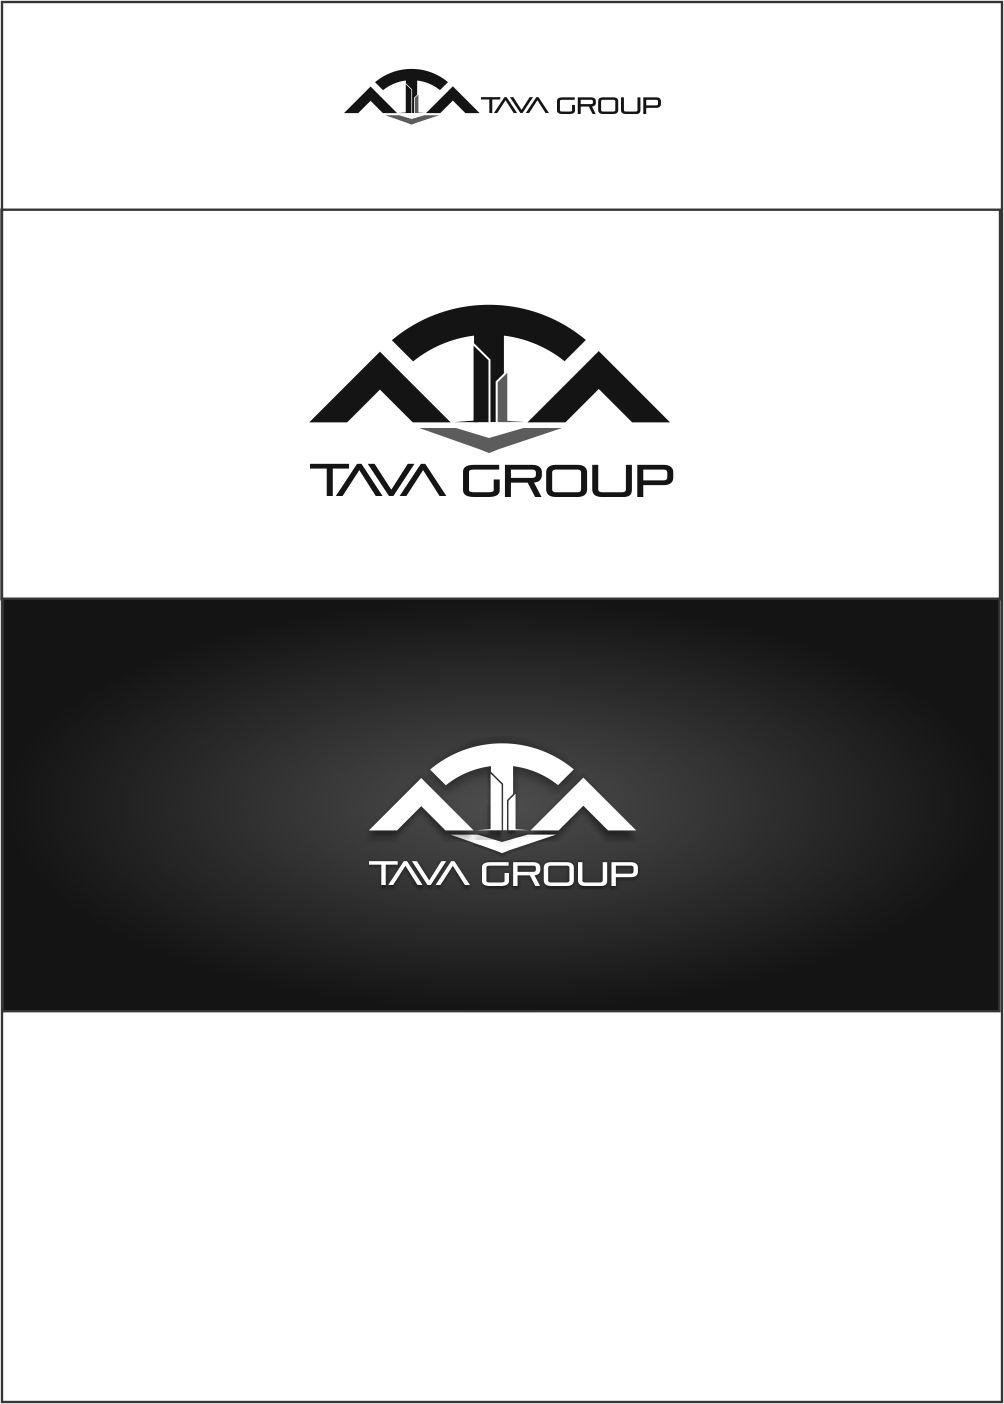 Logo Design by ian69 - Entry No. 259 in the Logo Design Contest Creative Logo Design for Tava Group.